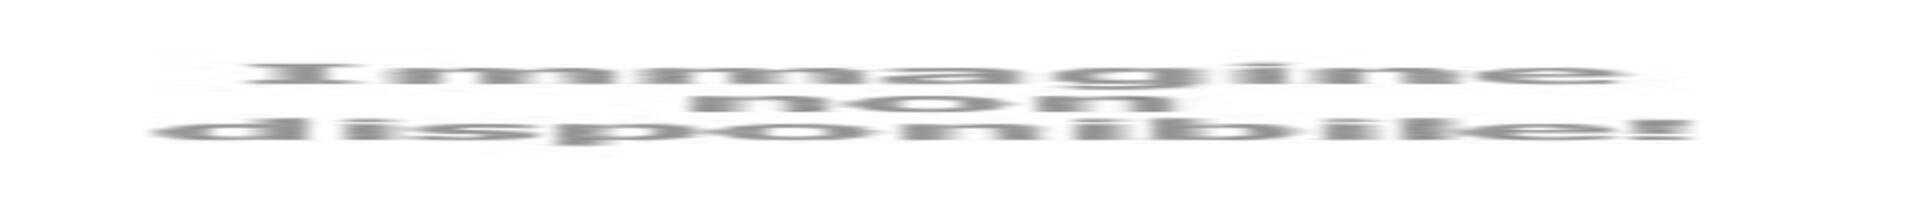 blumenhotel de angebot-fuer-fitness-messe-rimini-wellness-im-hotel-in-meeresnaehe 015